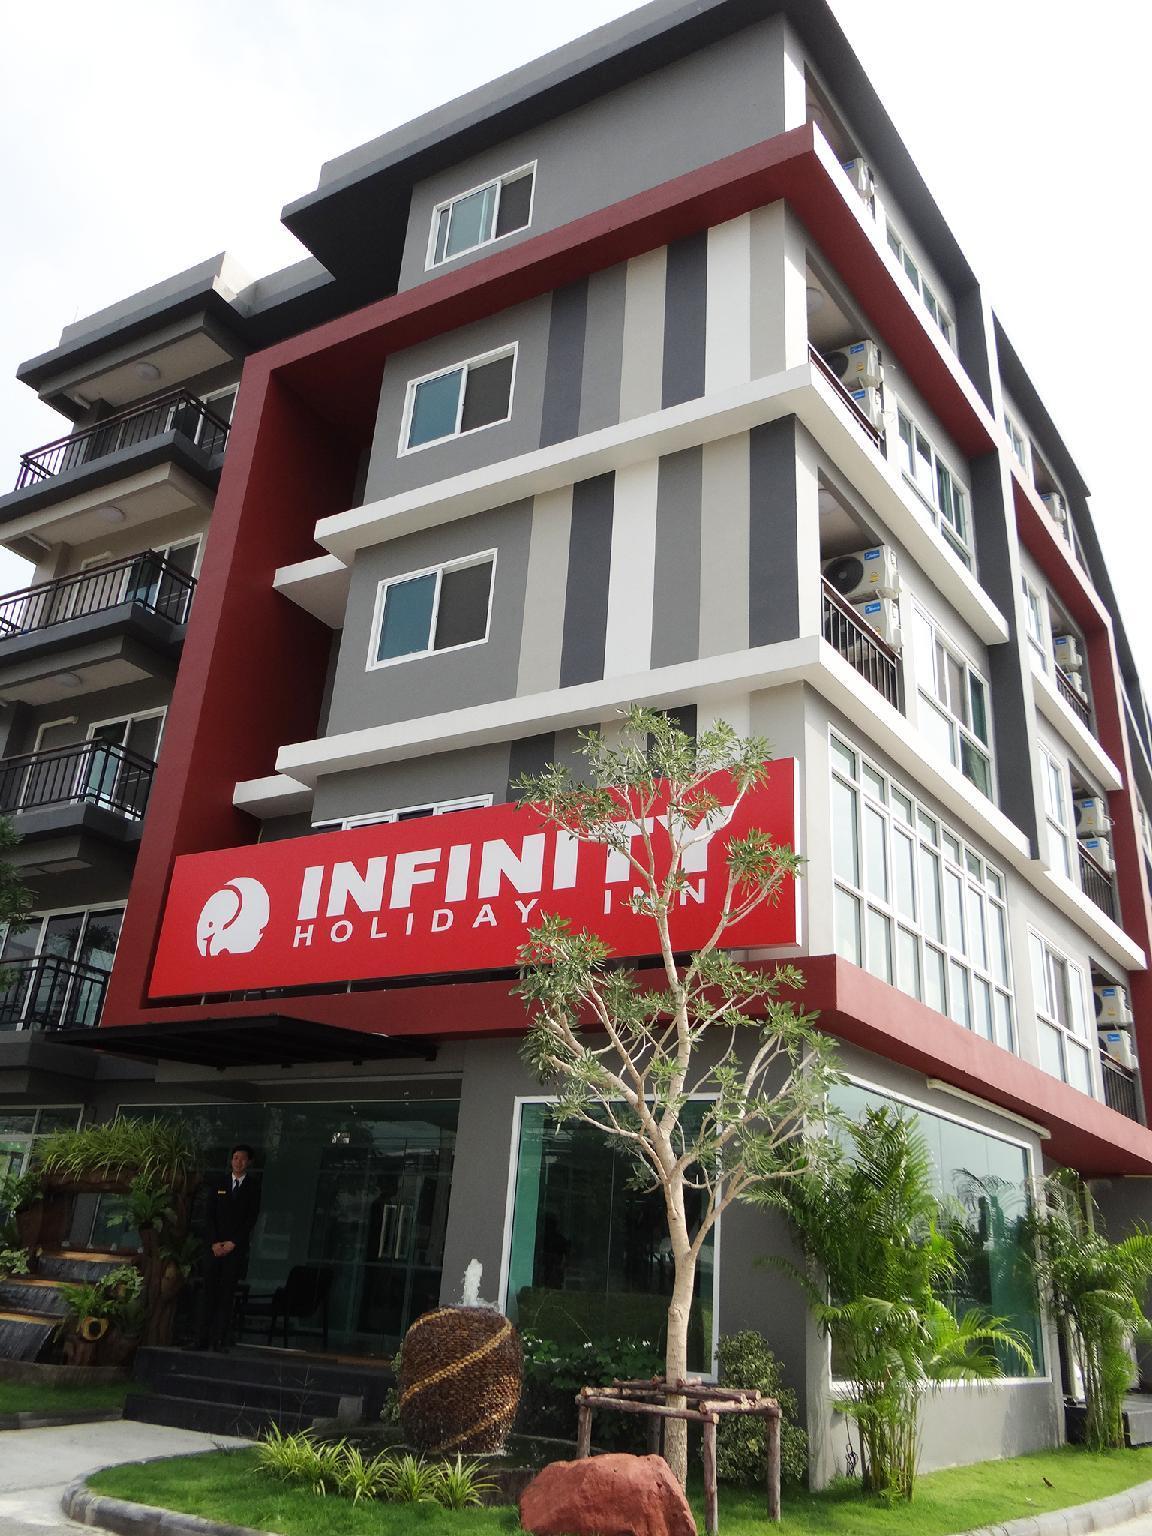 Infinity Holiday Inn